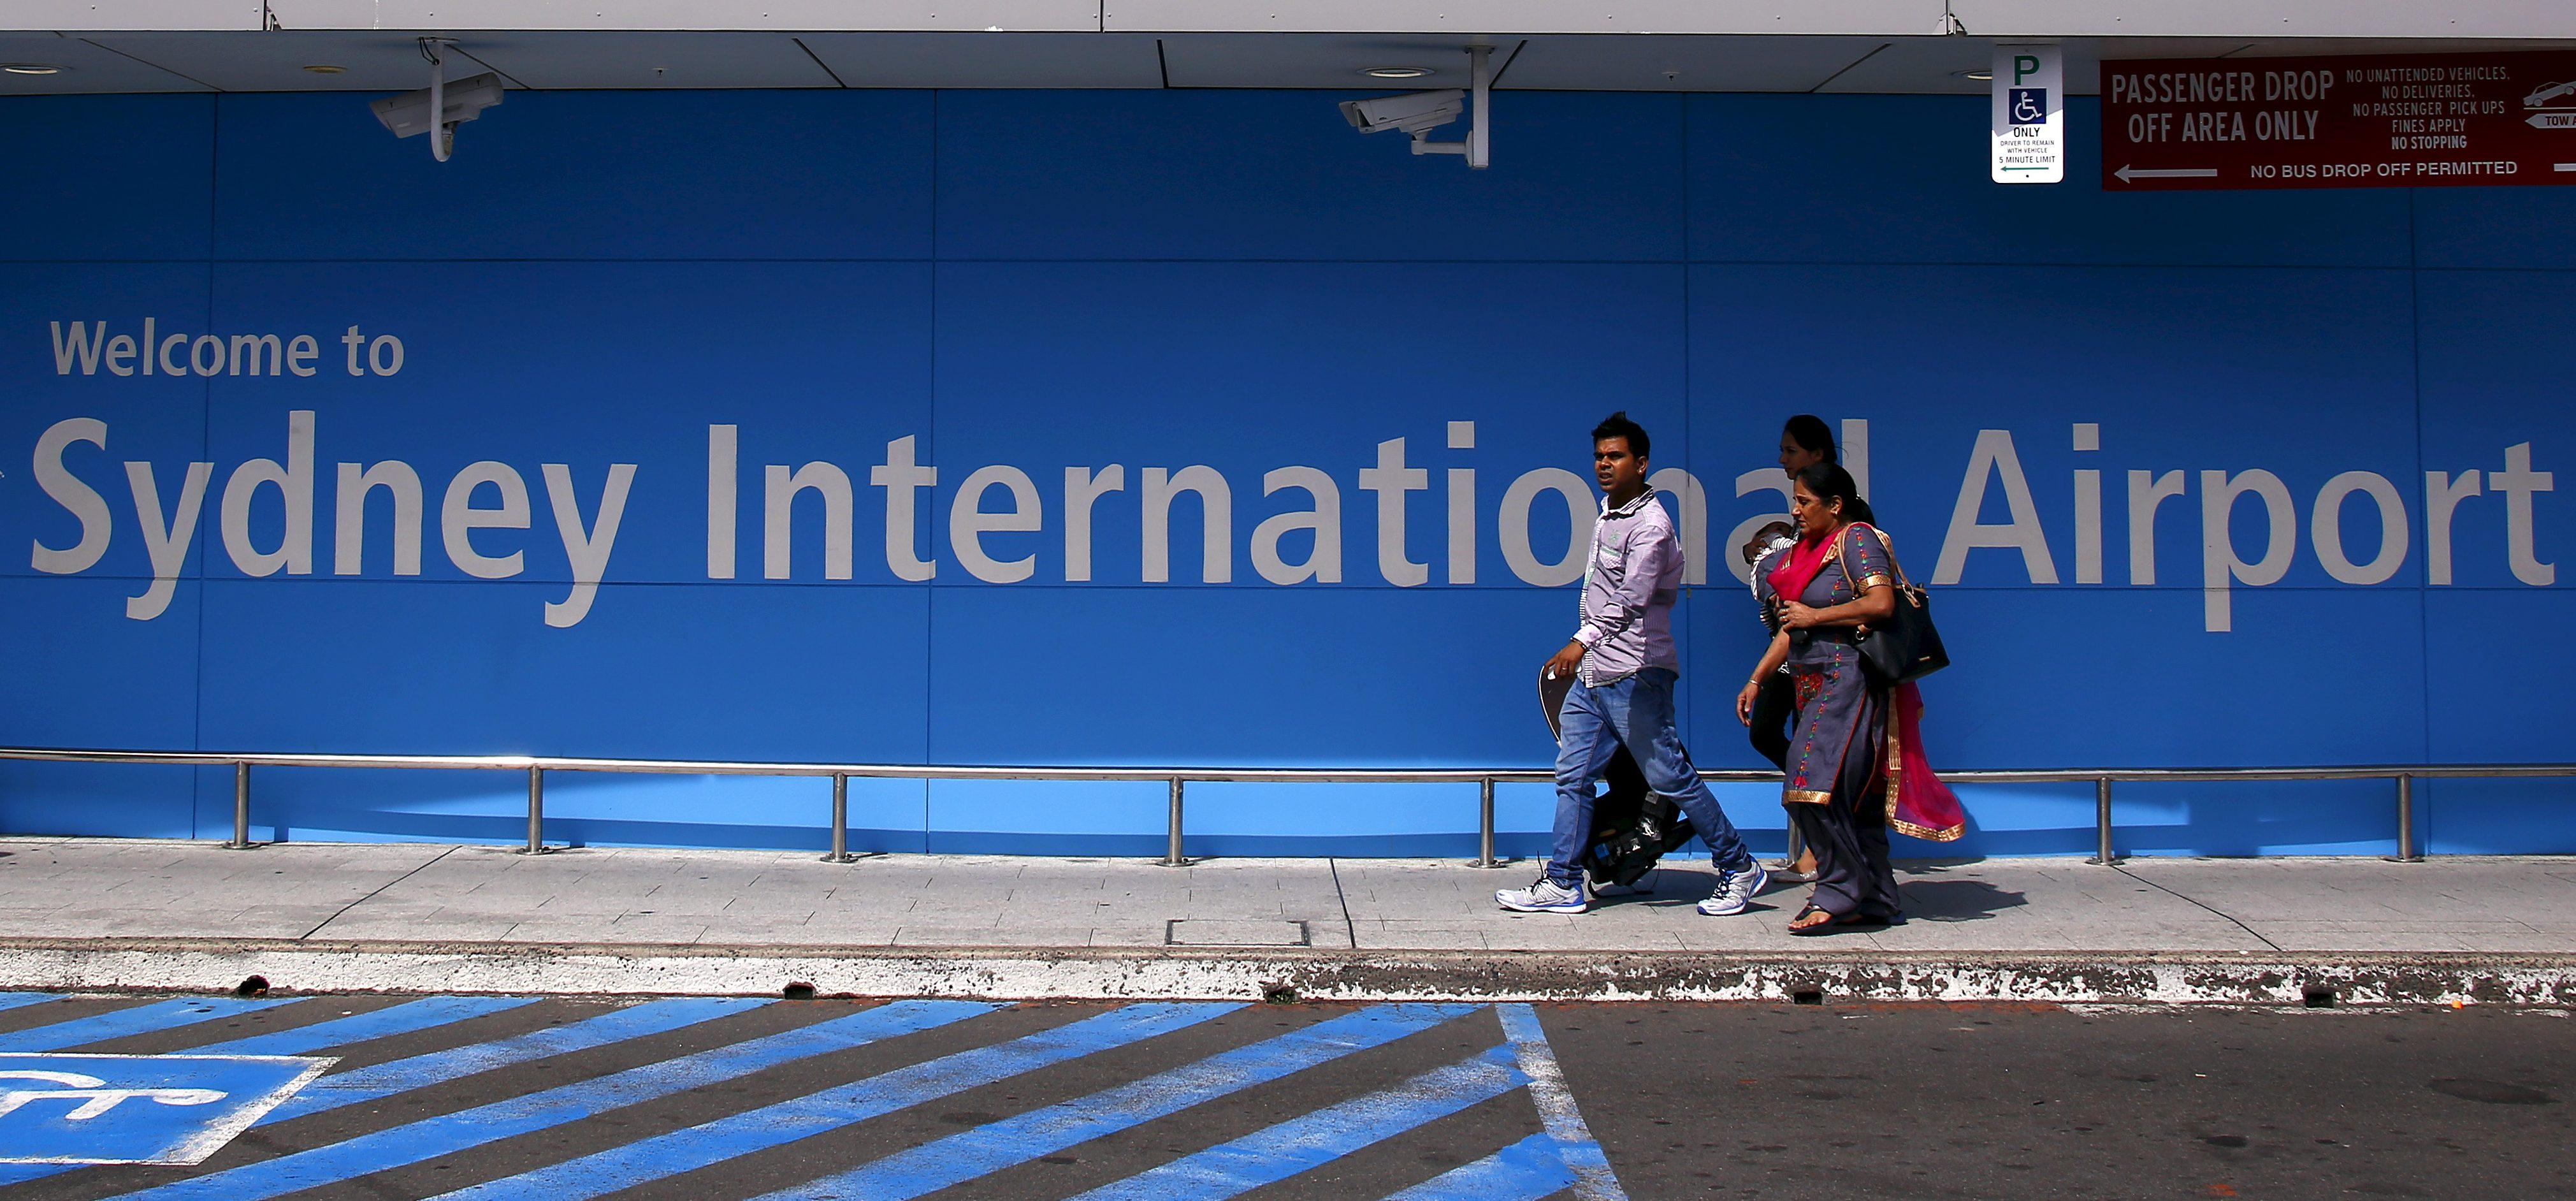 Passengers walk towards the departures area at Sydney International Airport, Australia, March 23, 2016.